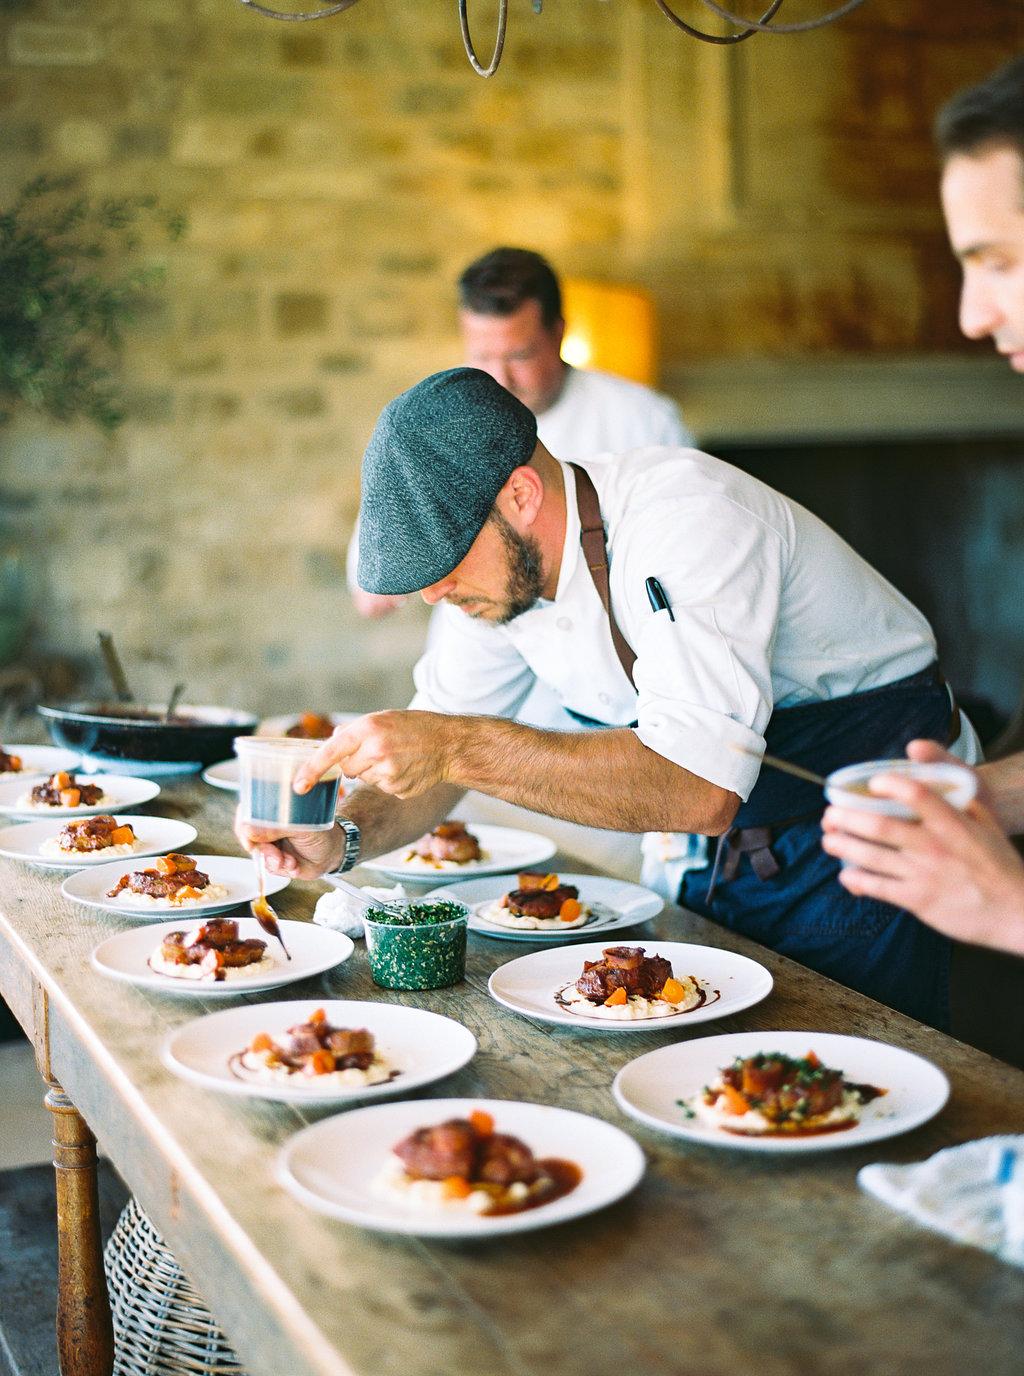 www.santabarbarawedding.com | Sunstone Winery | Jen Rodriguez | Dinner Party | Food Preparation